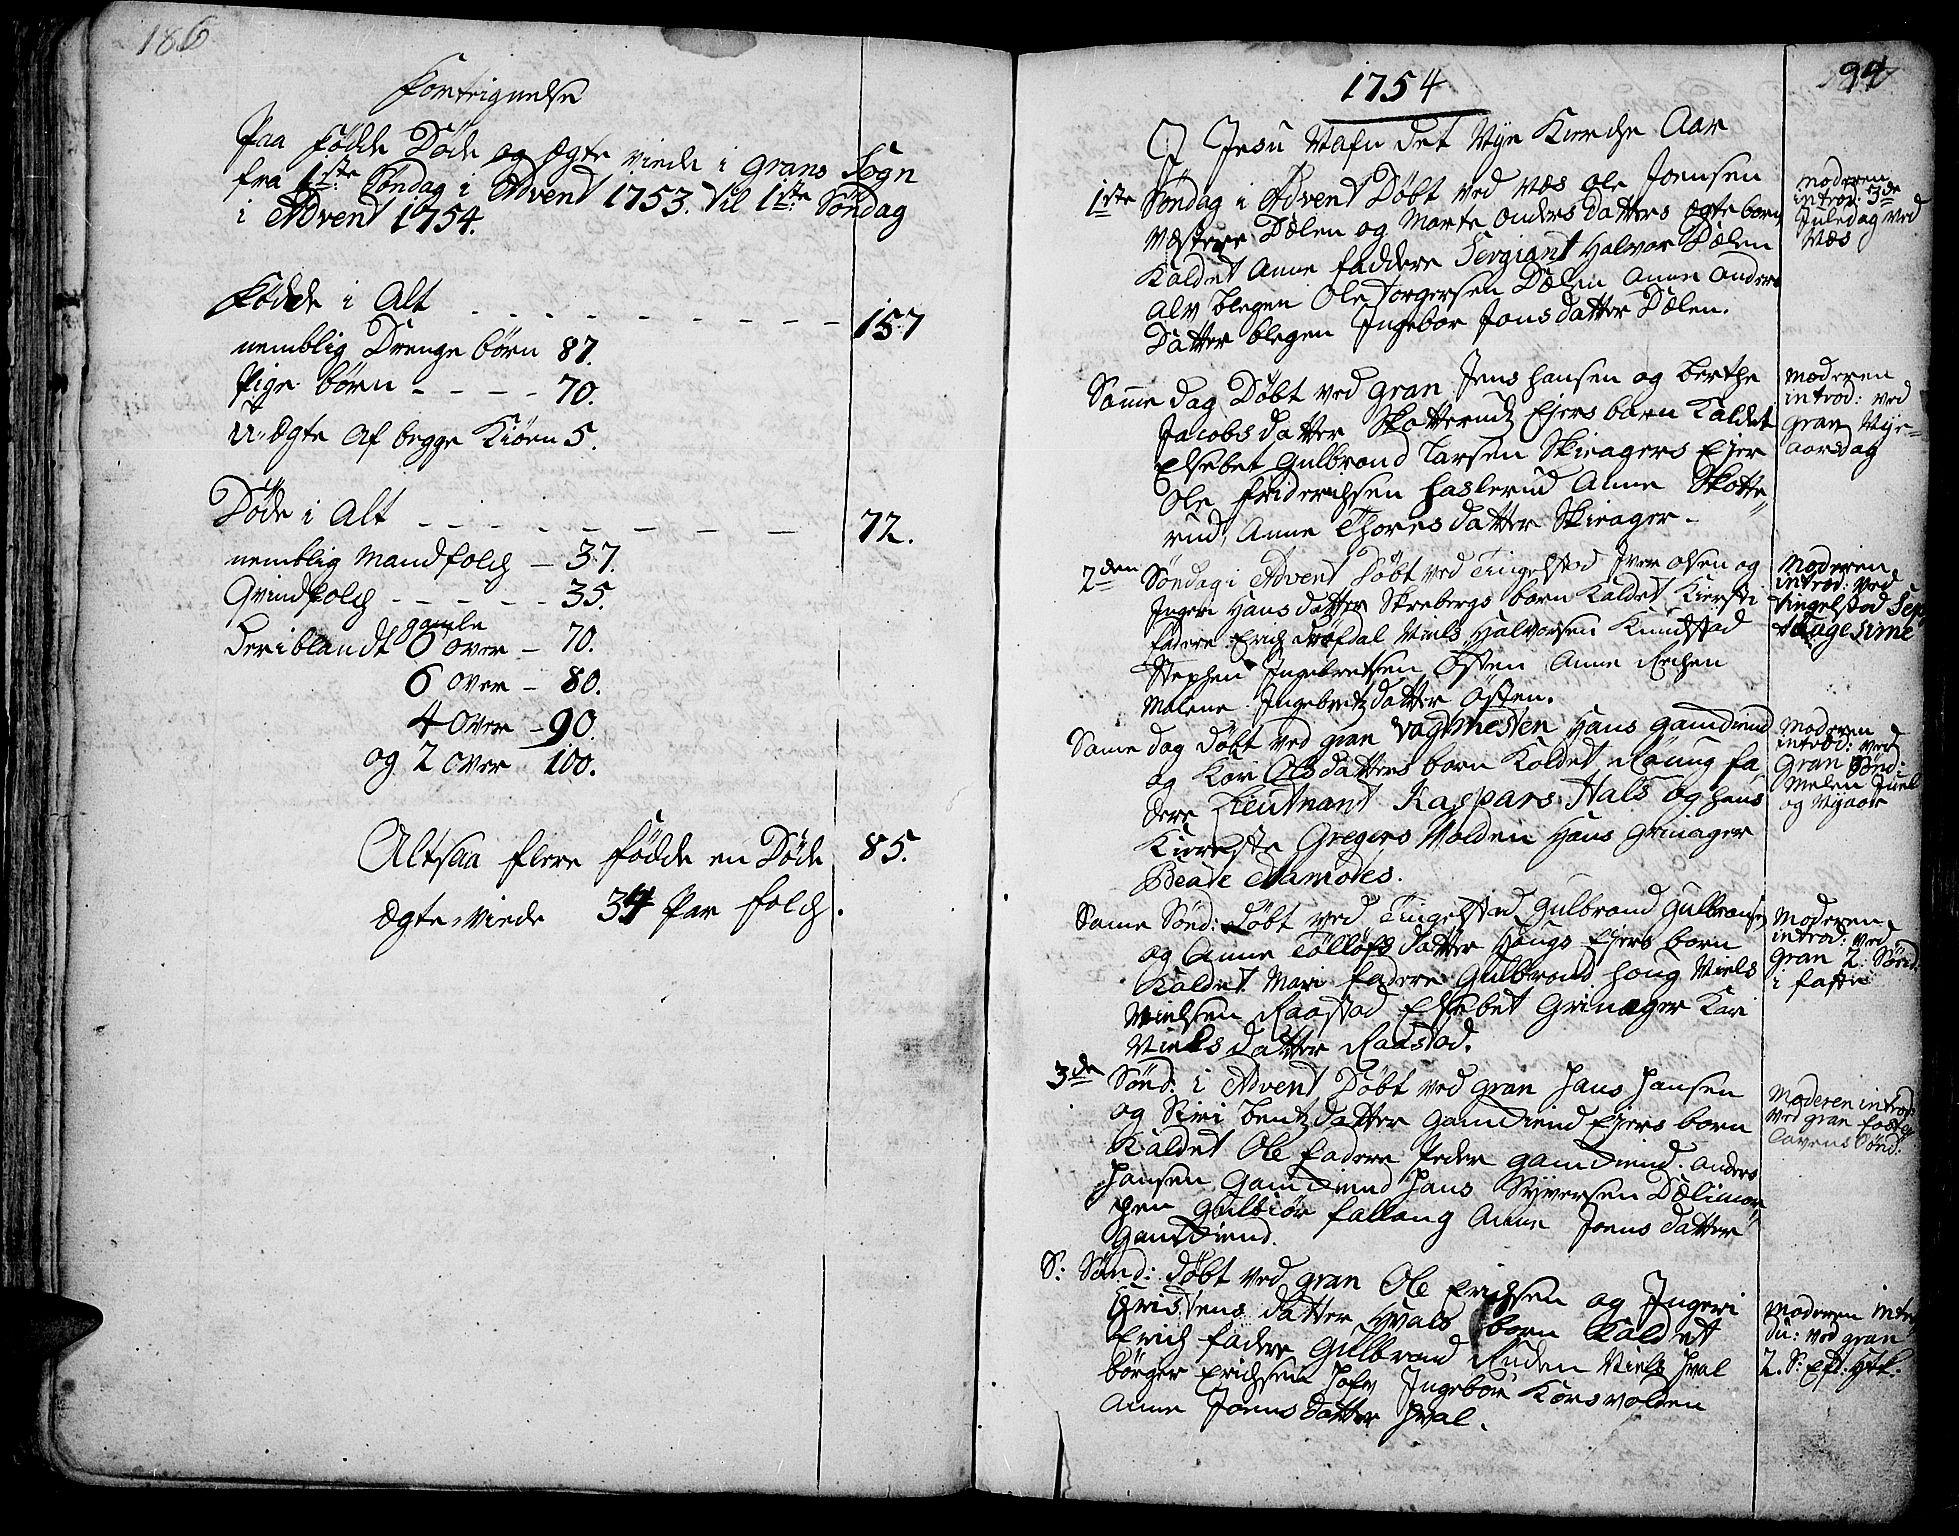 SAH, Gran prestekontor, Ministerialbok nr. 3, 1745-1758, s. 94